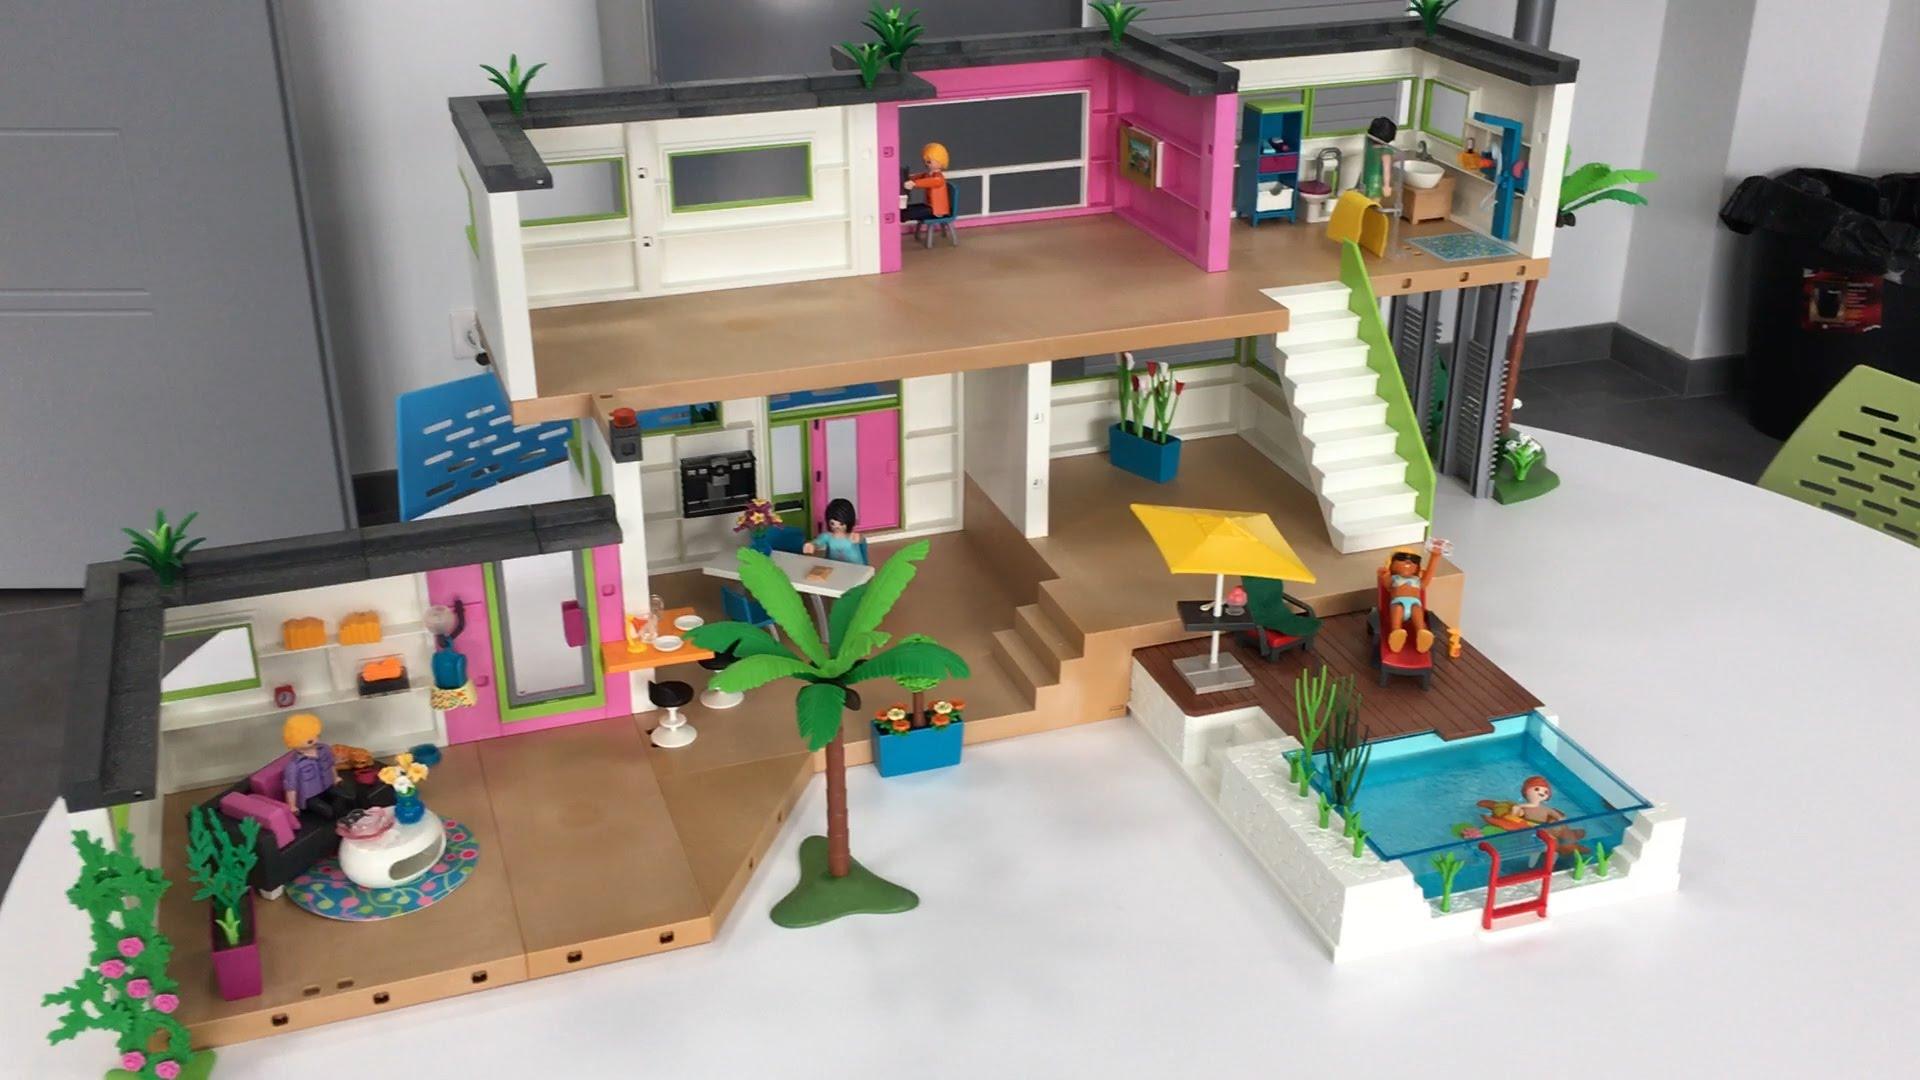 maison moderne playmobil leclerc. Black Bedroom Furniture Sets. Home Design Ideas